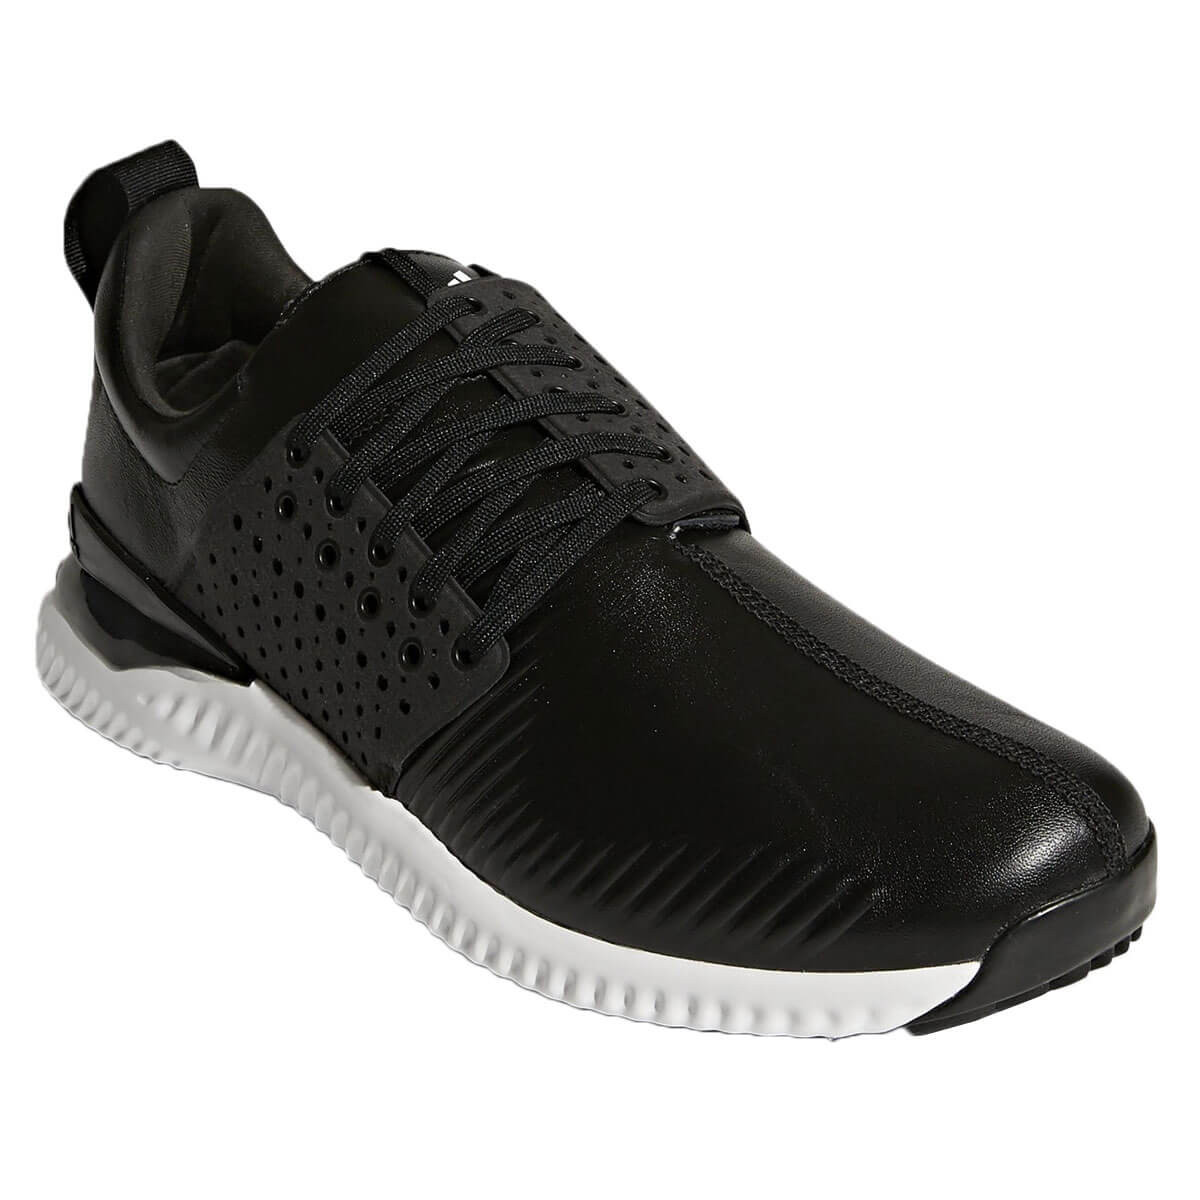 adidas golf shoes mens uk